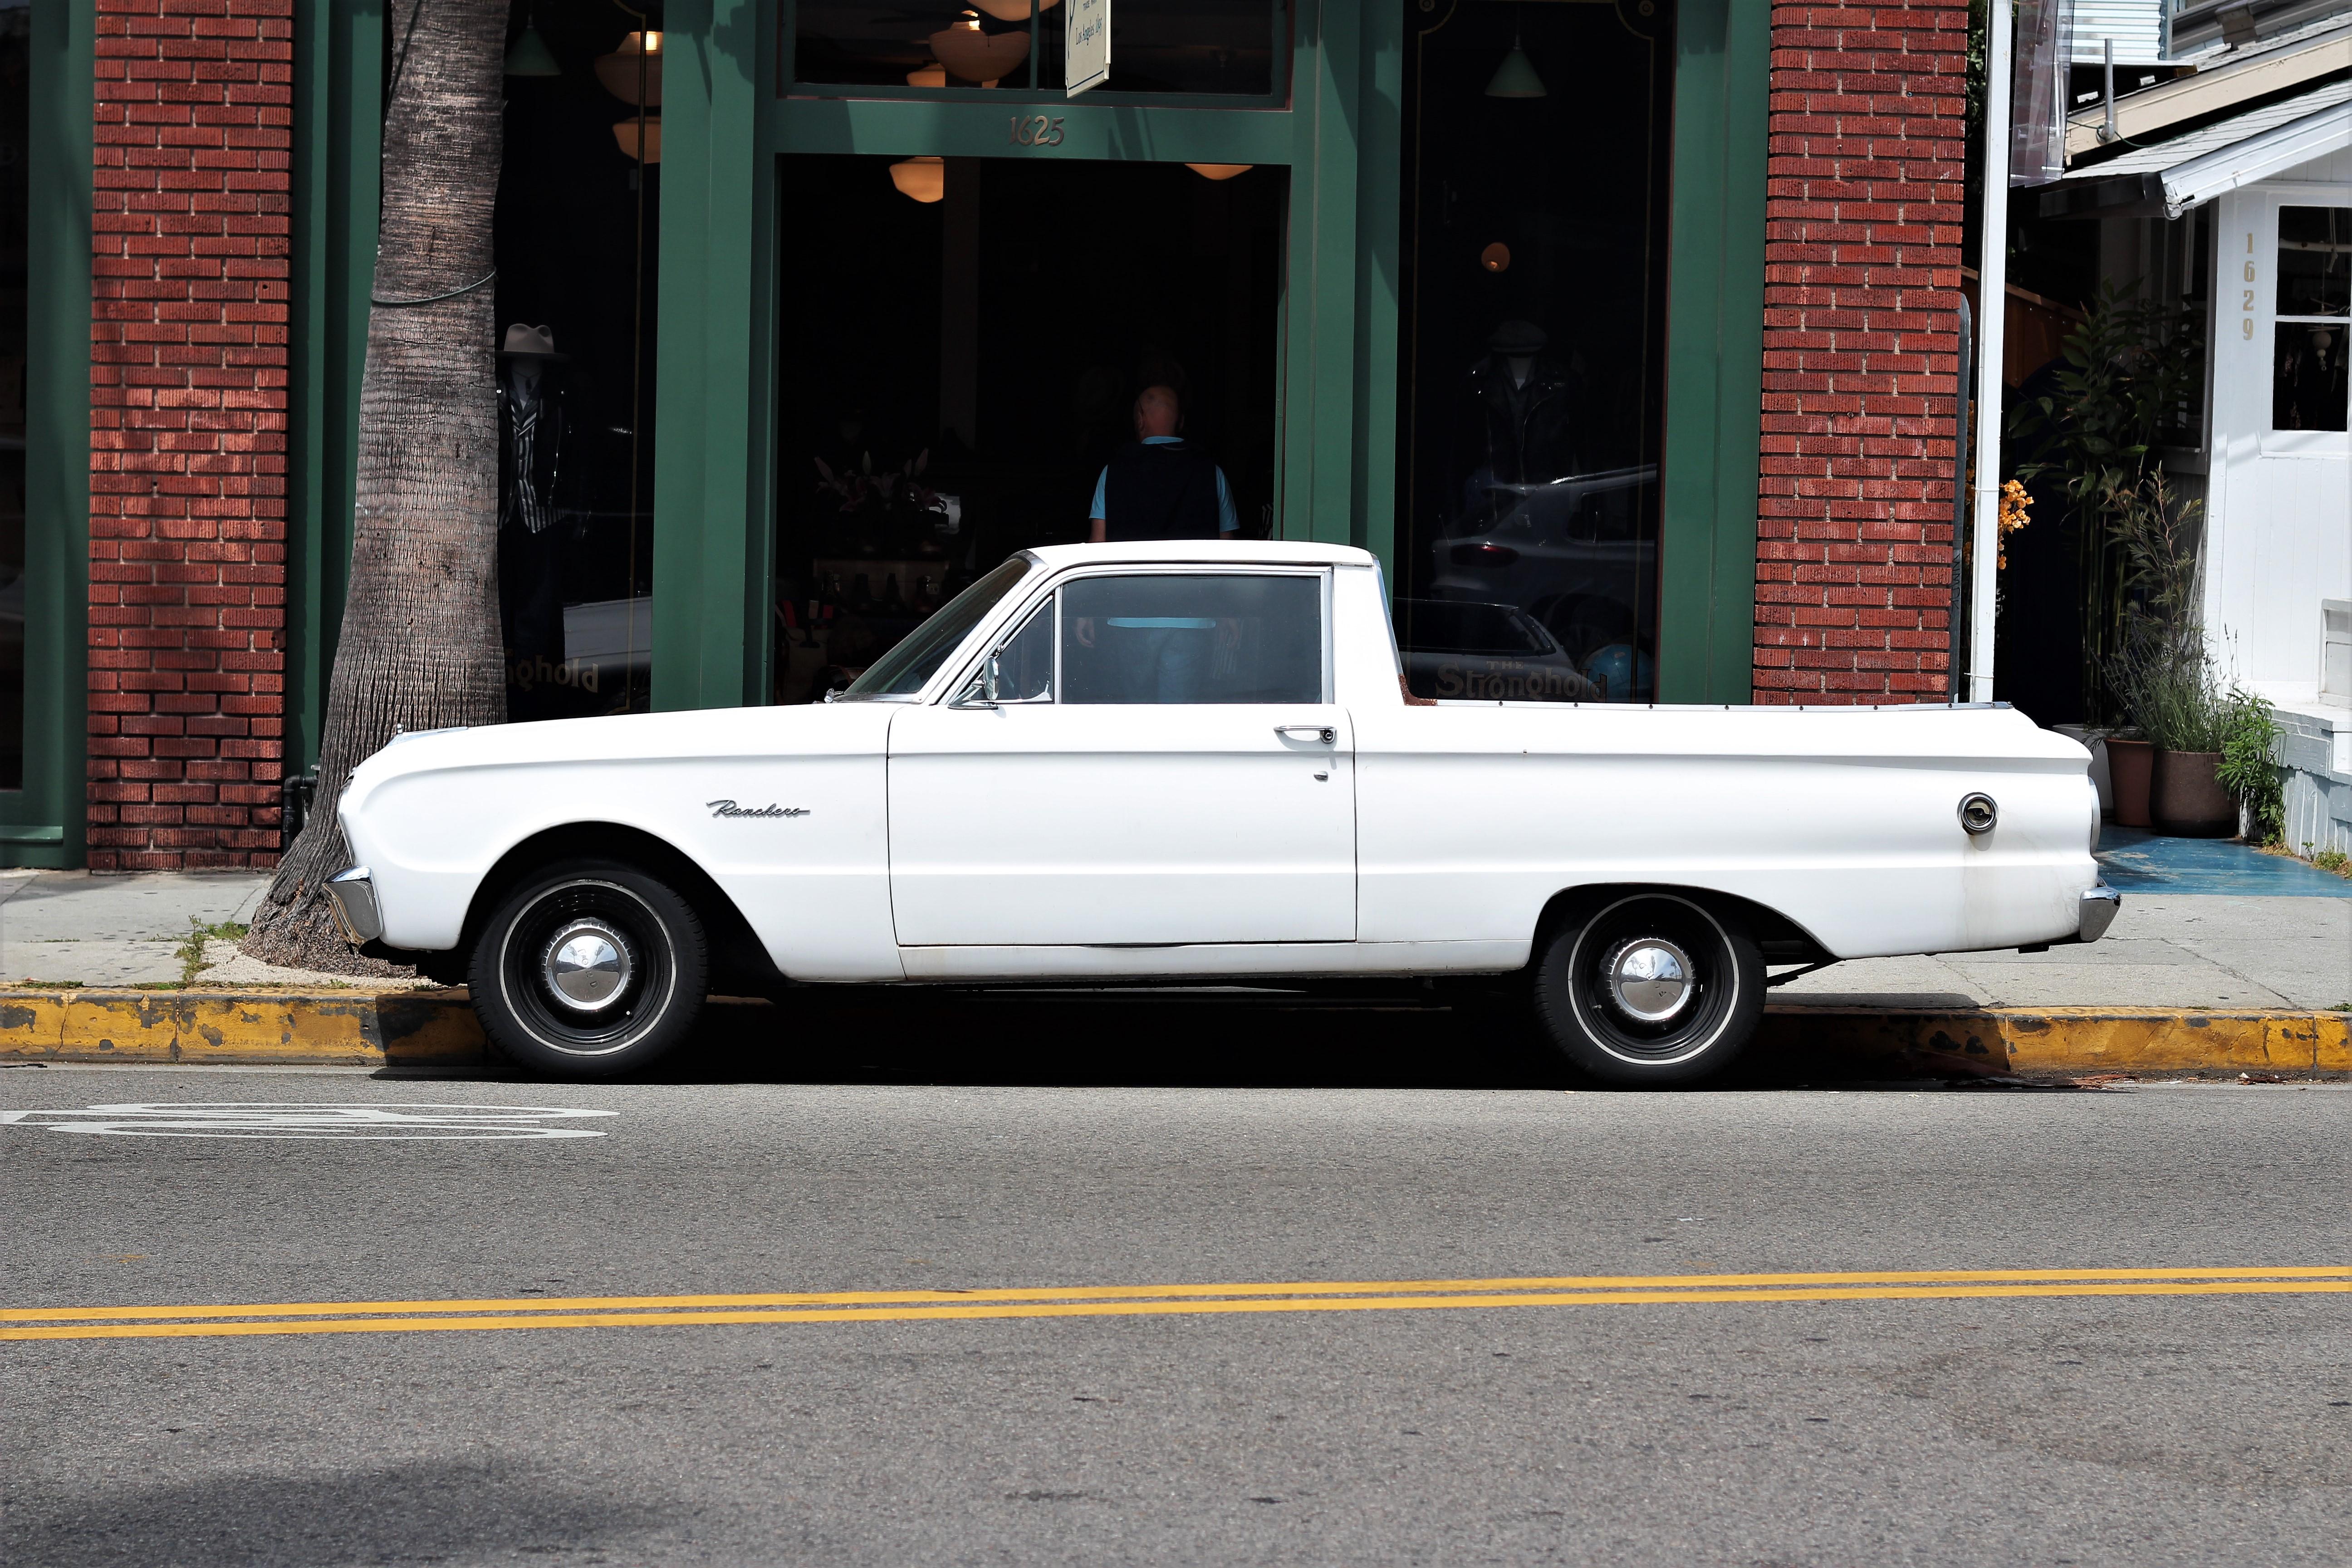 14 1963 ford ranchero 3 la car spotting. Black Bedroom Furniture Sets. Home Design Ideas